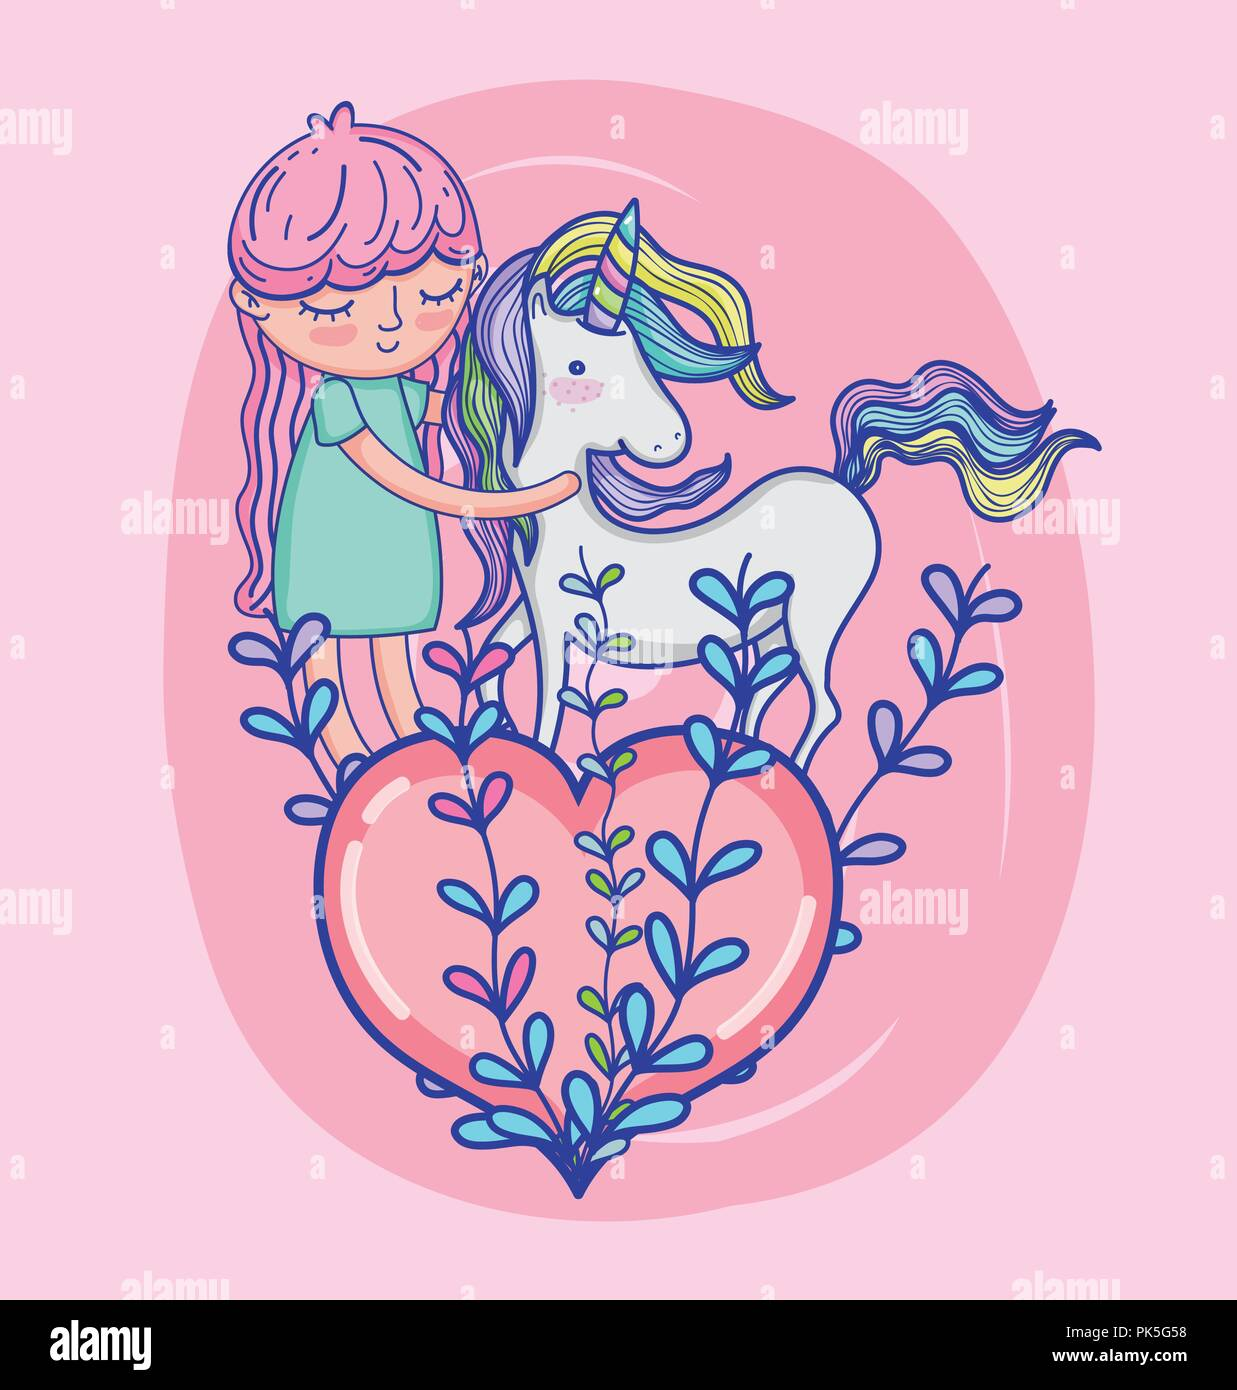 Cartoon Child Outline Stock Photos & Cartoon Child Outline Stock ...